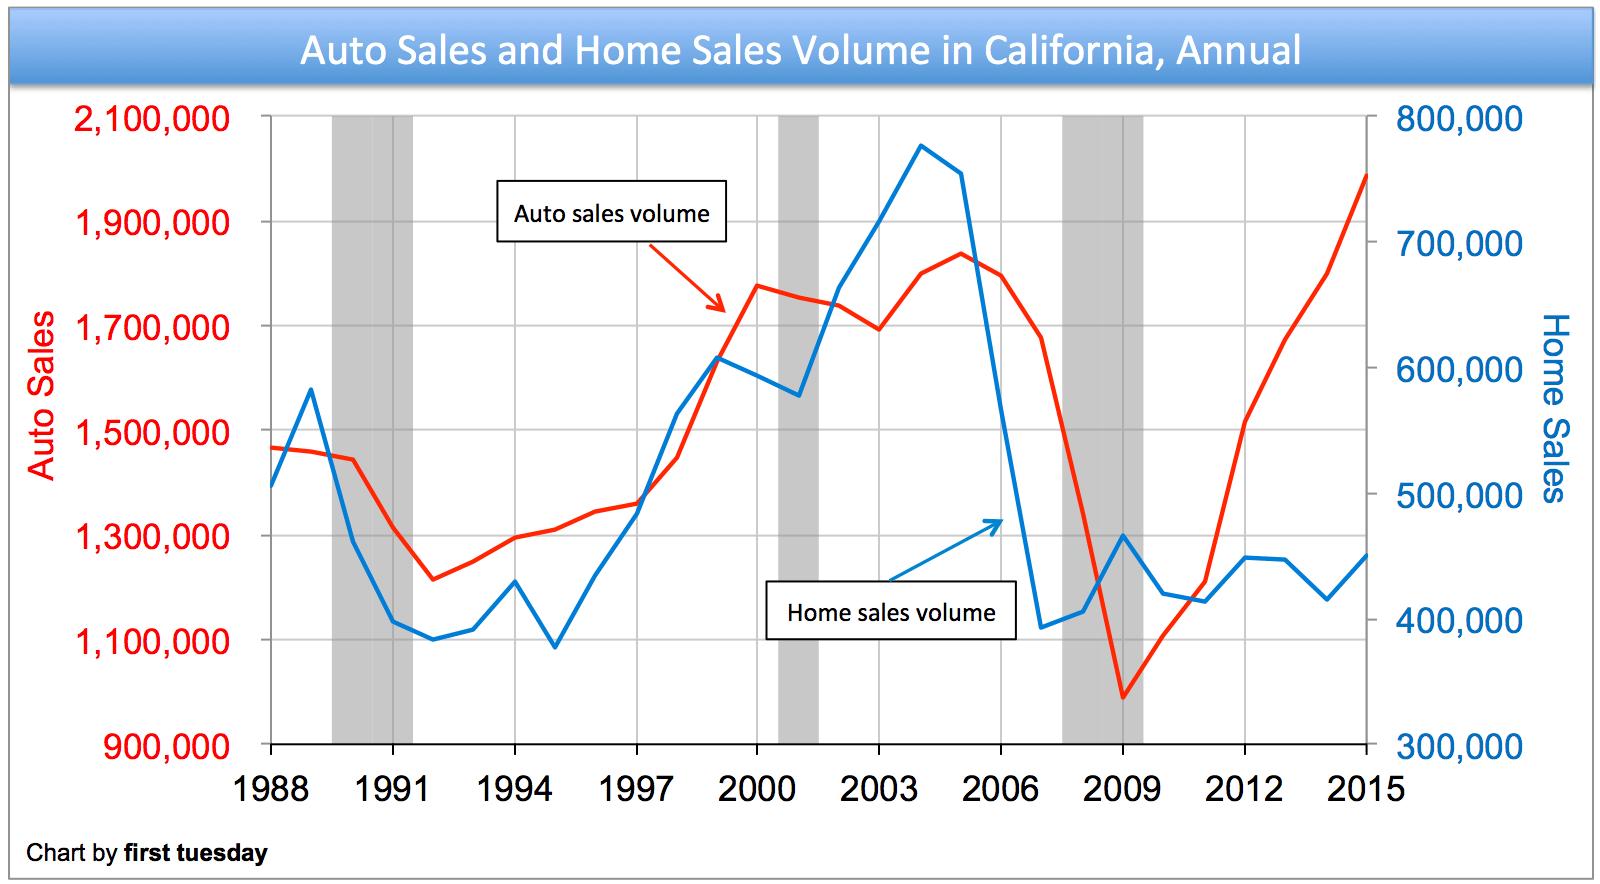 california-annual-auto-sales-housing-2016